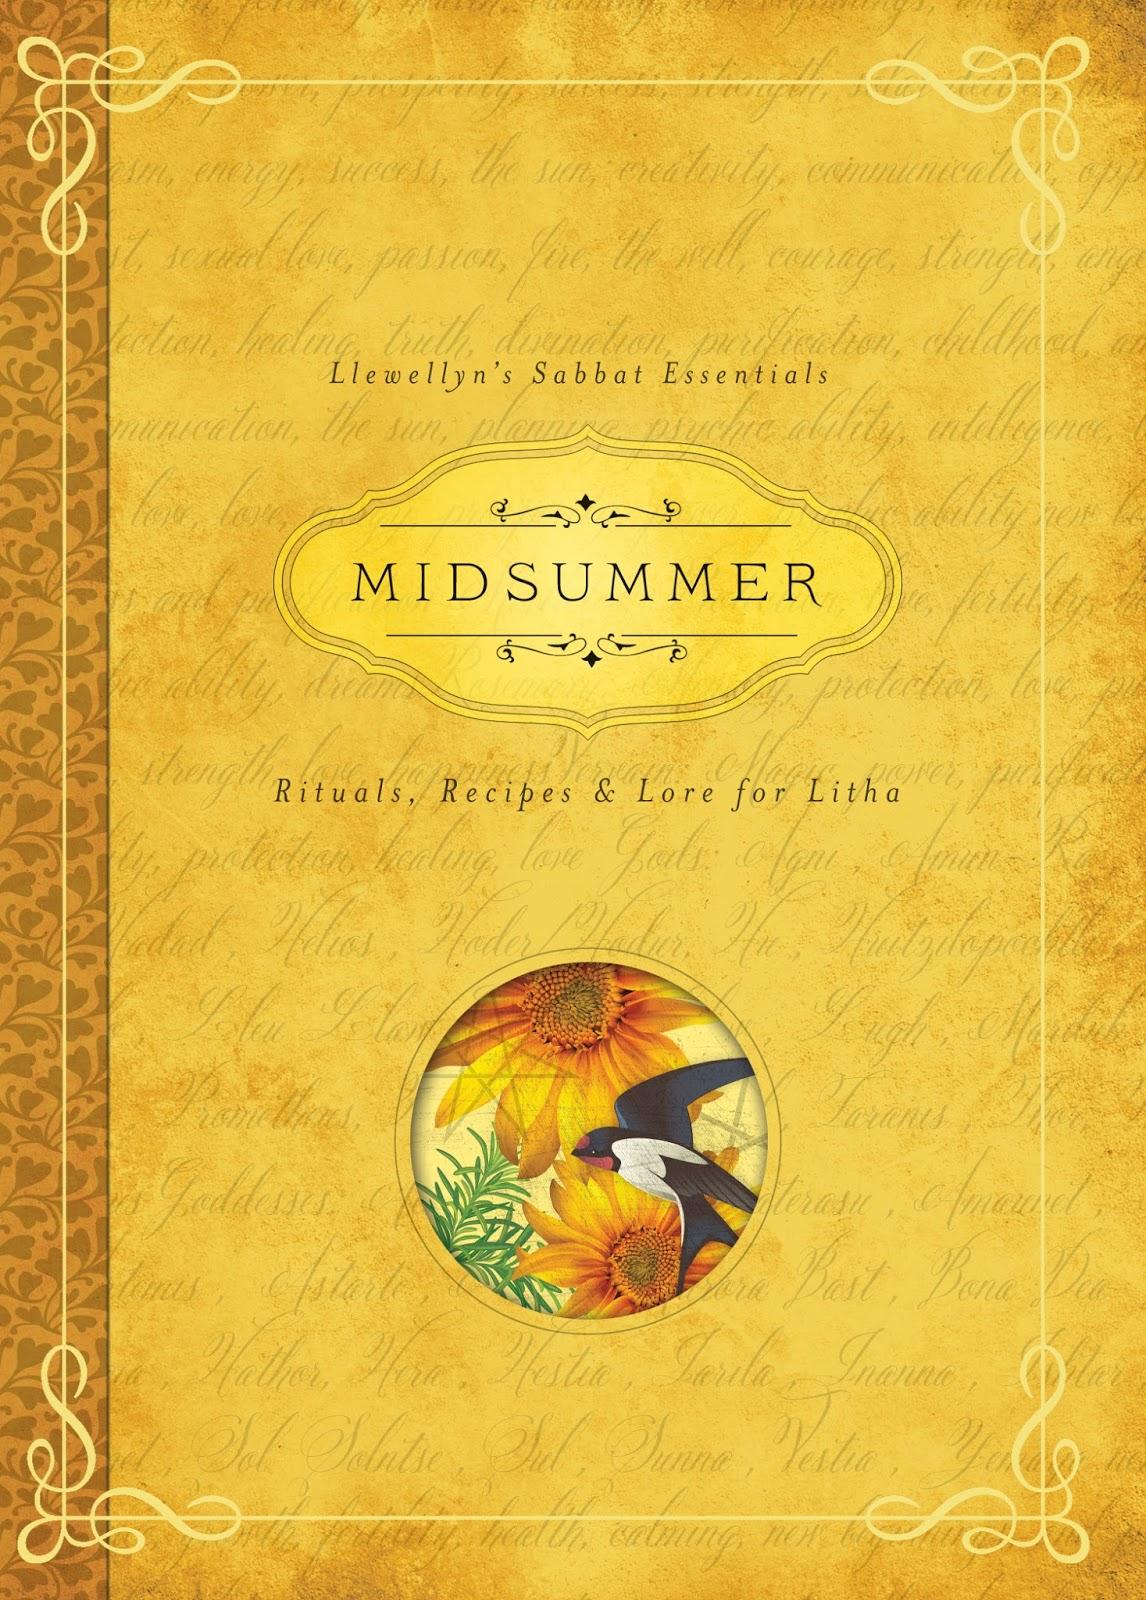 Midsummer Ritual: Calling Down the Sun - PaganSquare - PaganSquare